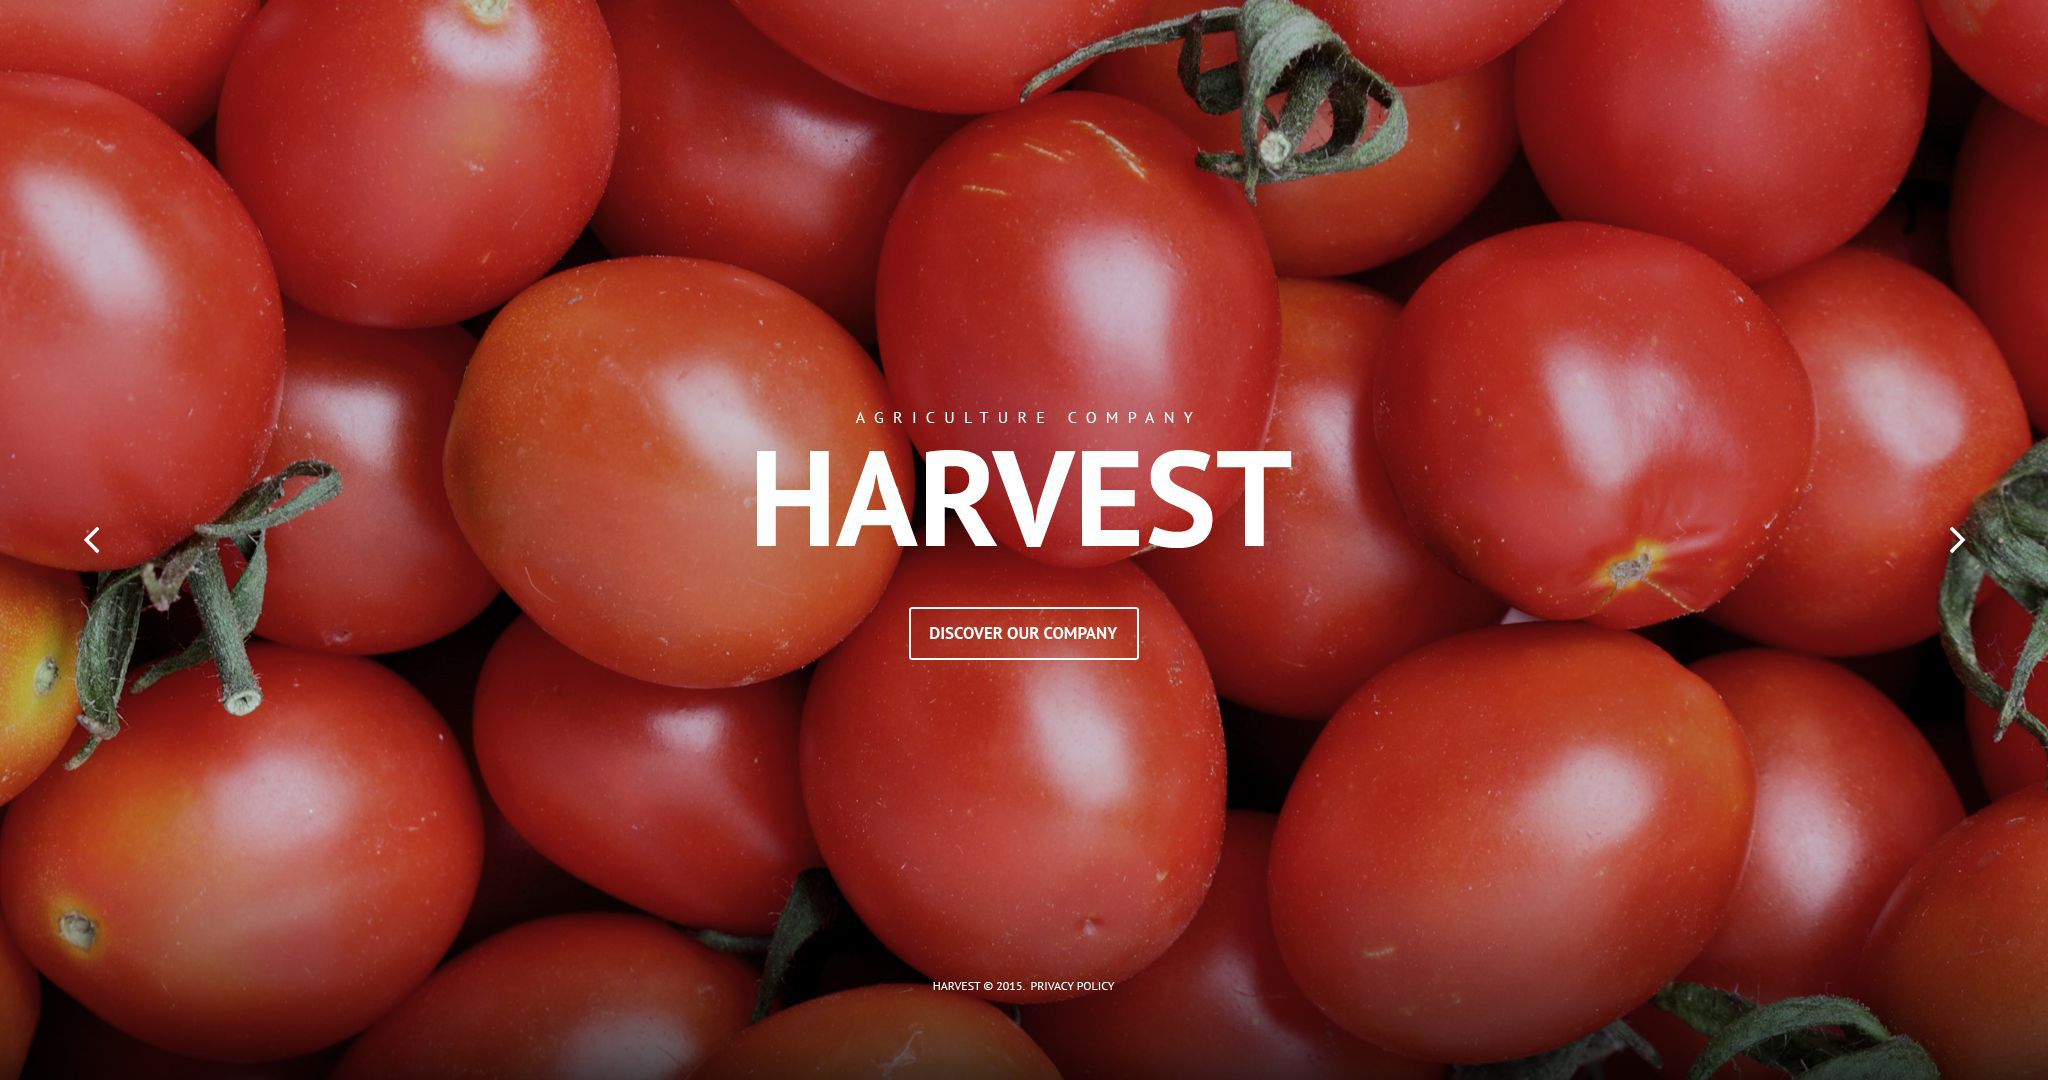 """Agriculture Company"" 响应式WordPress模板 #53933 - 截图"